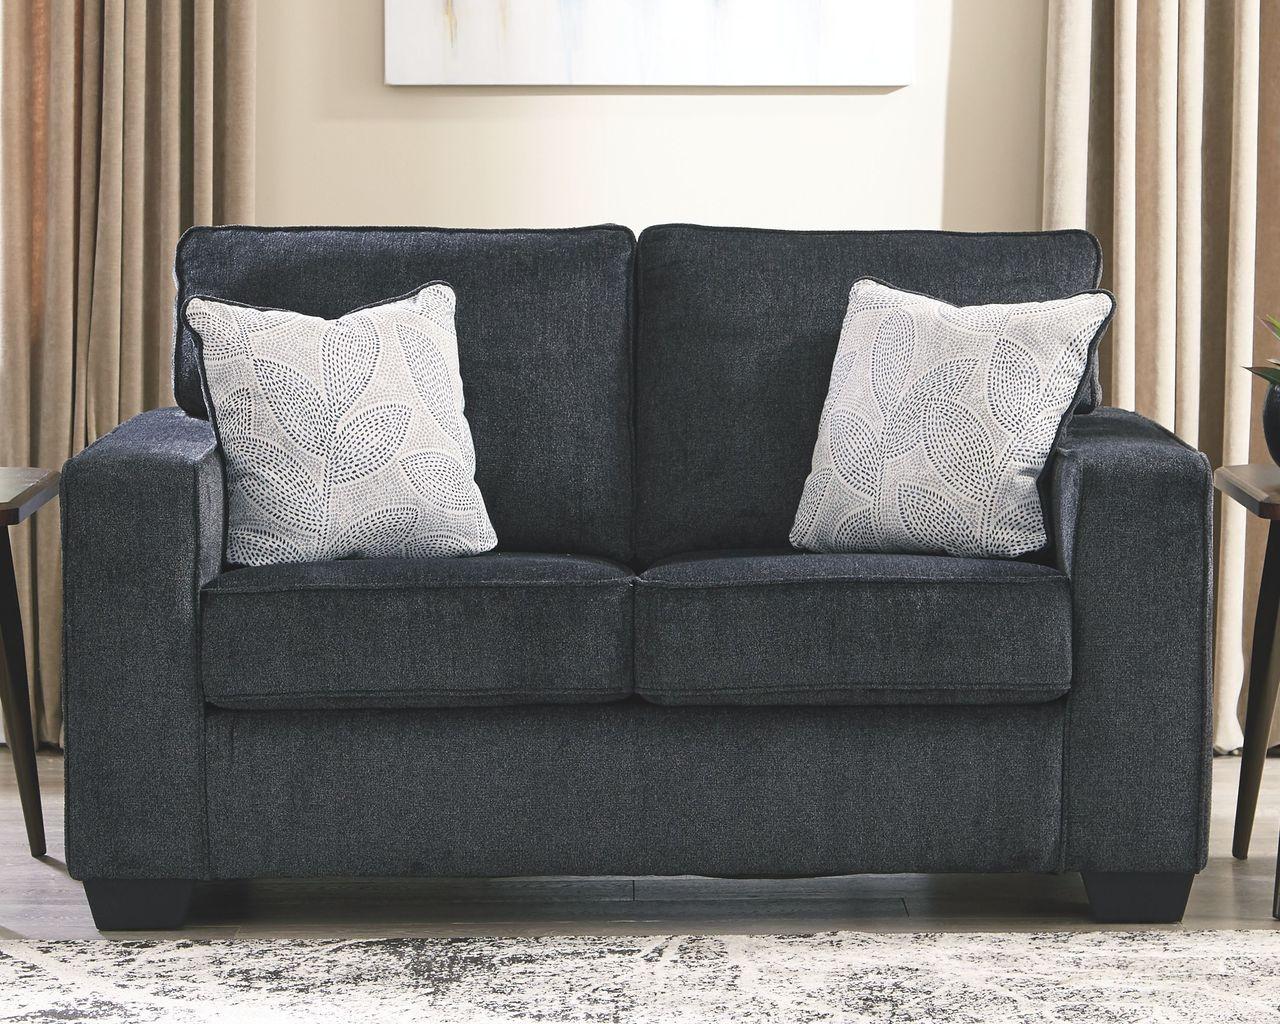 Brilliant Altari Slate Loveseat Machost Co Dining Chair Design Ideas Machostcouk